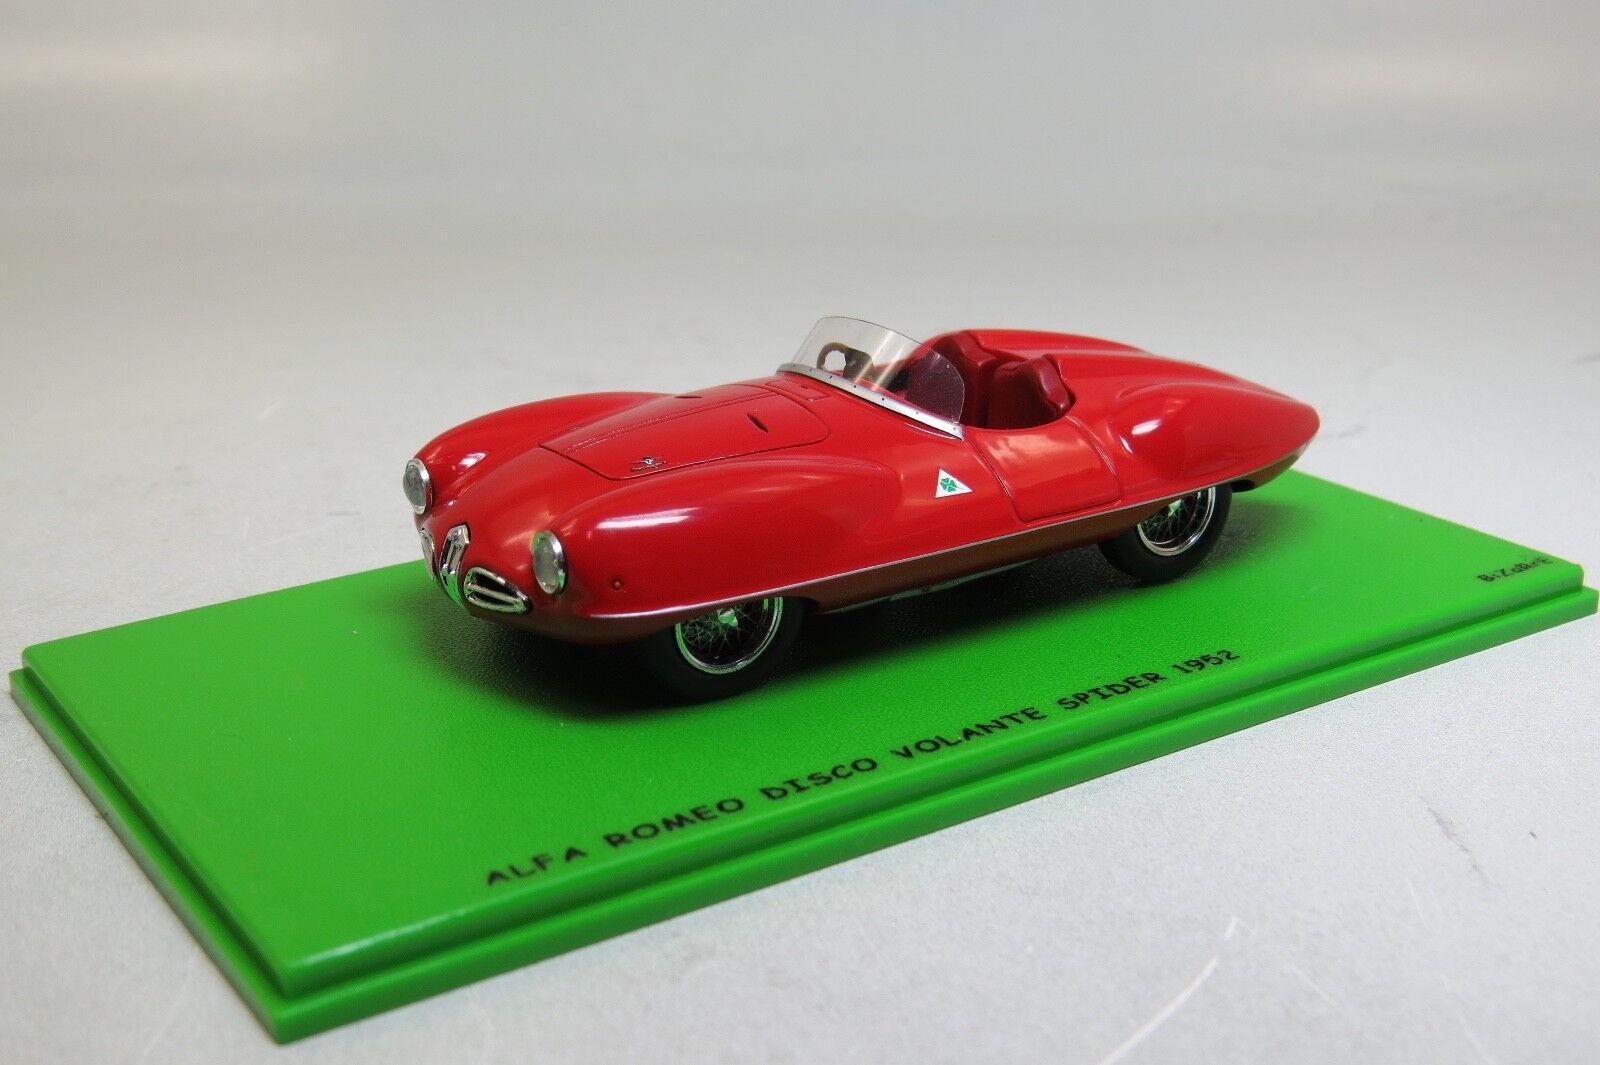 Alfa romeo disco volante spider 1952 von bizarren bz251 funke